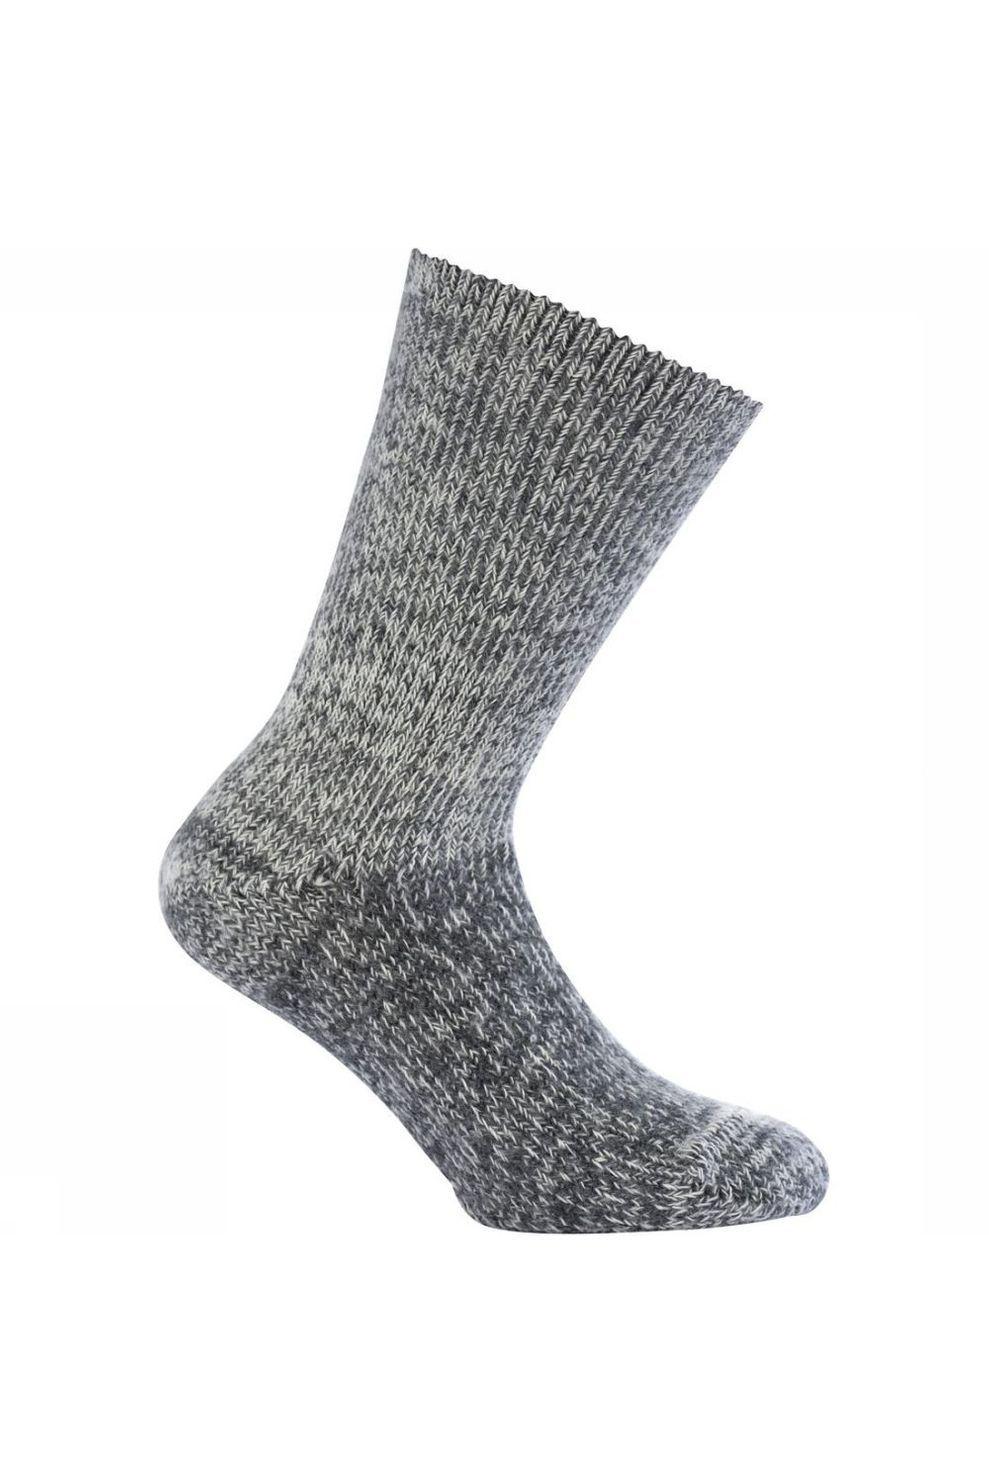 Woolpower Kous Classic 800 (warmest everyday sock) - Grijs Mengeling - Maten: 37/39, 40/42, 43/45, 4